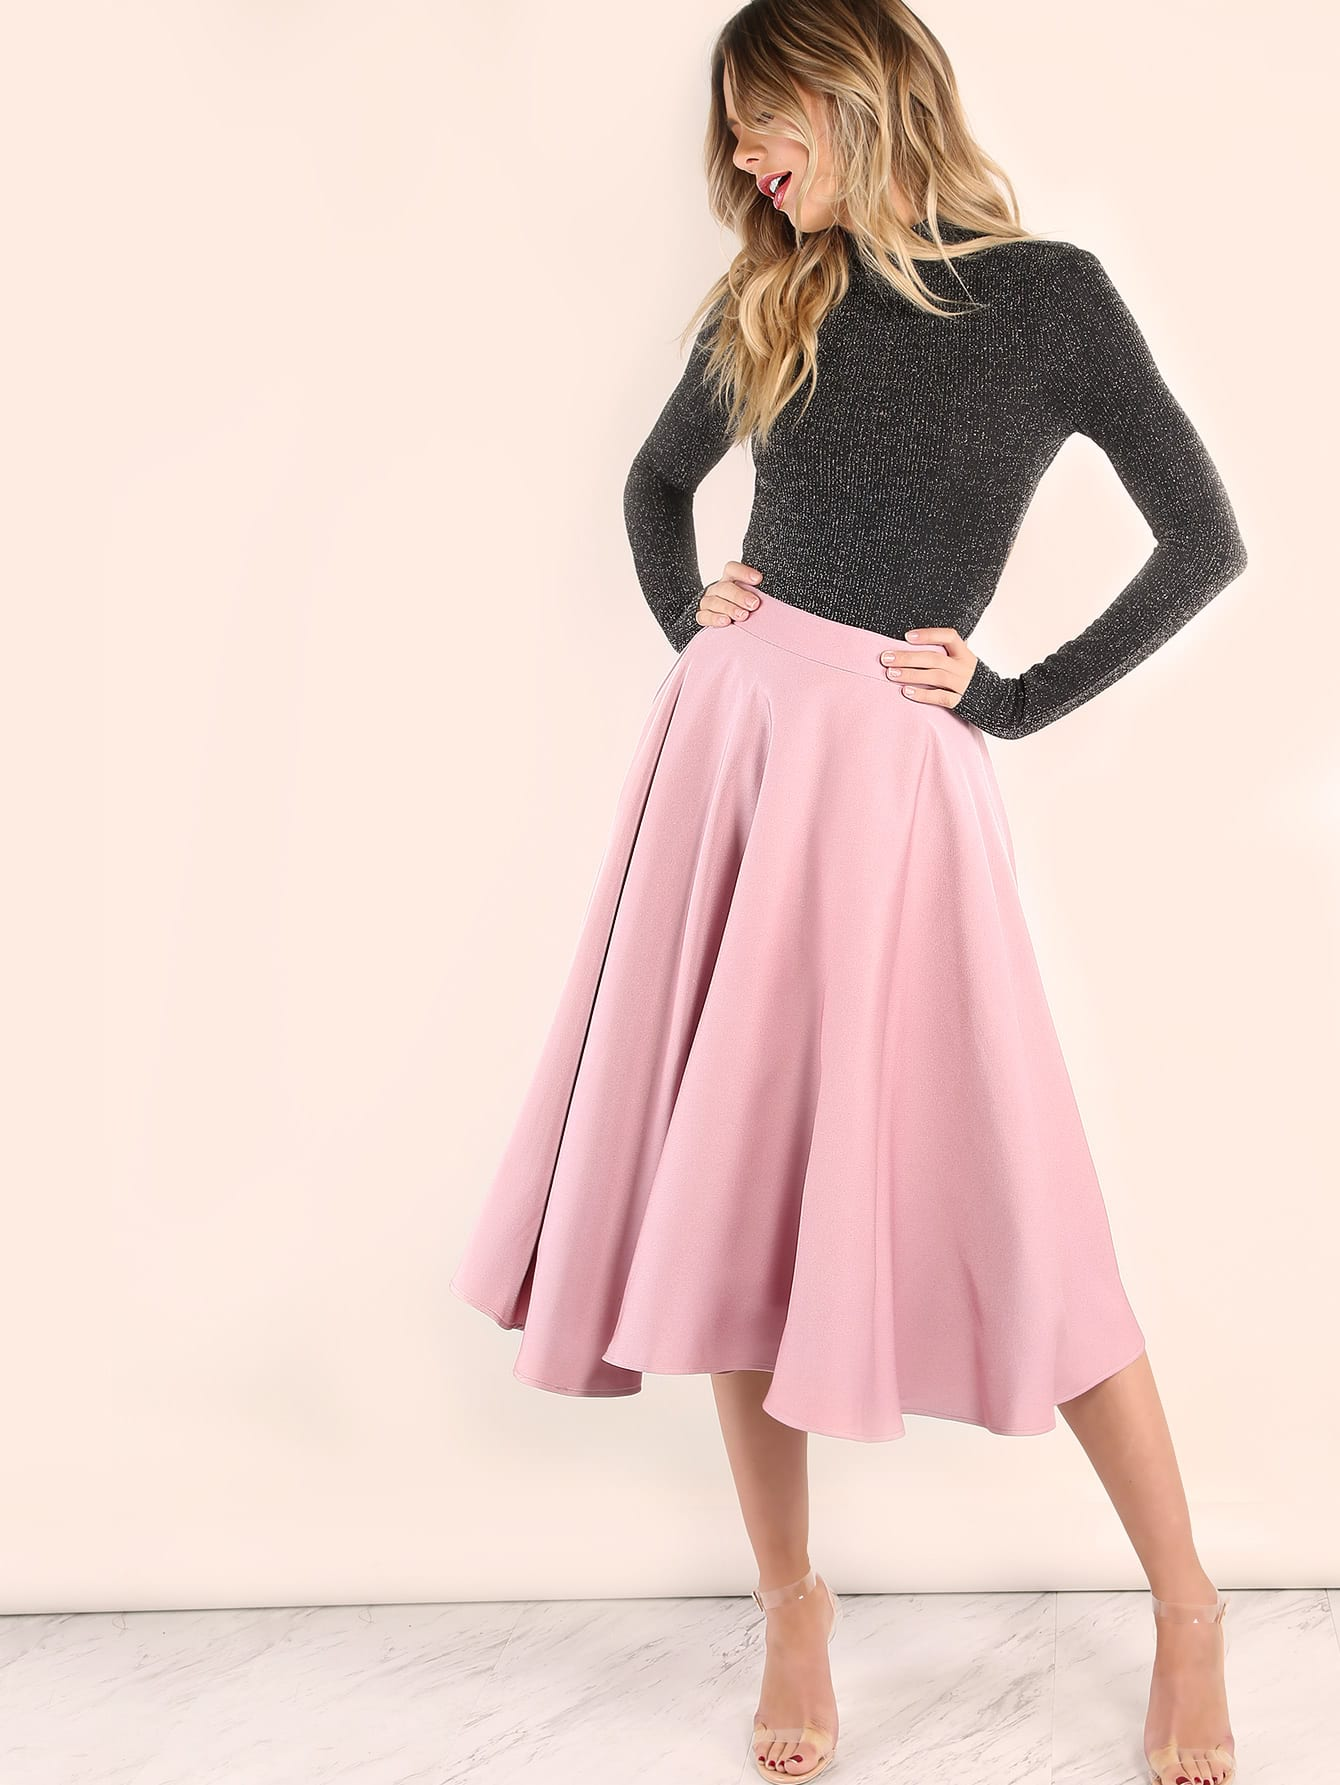 Pink Band Waist Circle SkirtPink Band Waist Circle Skirt<br><br>color: Pink<br>size: L,S,XS